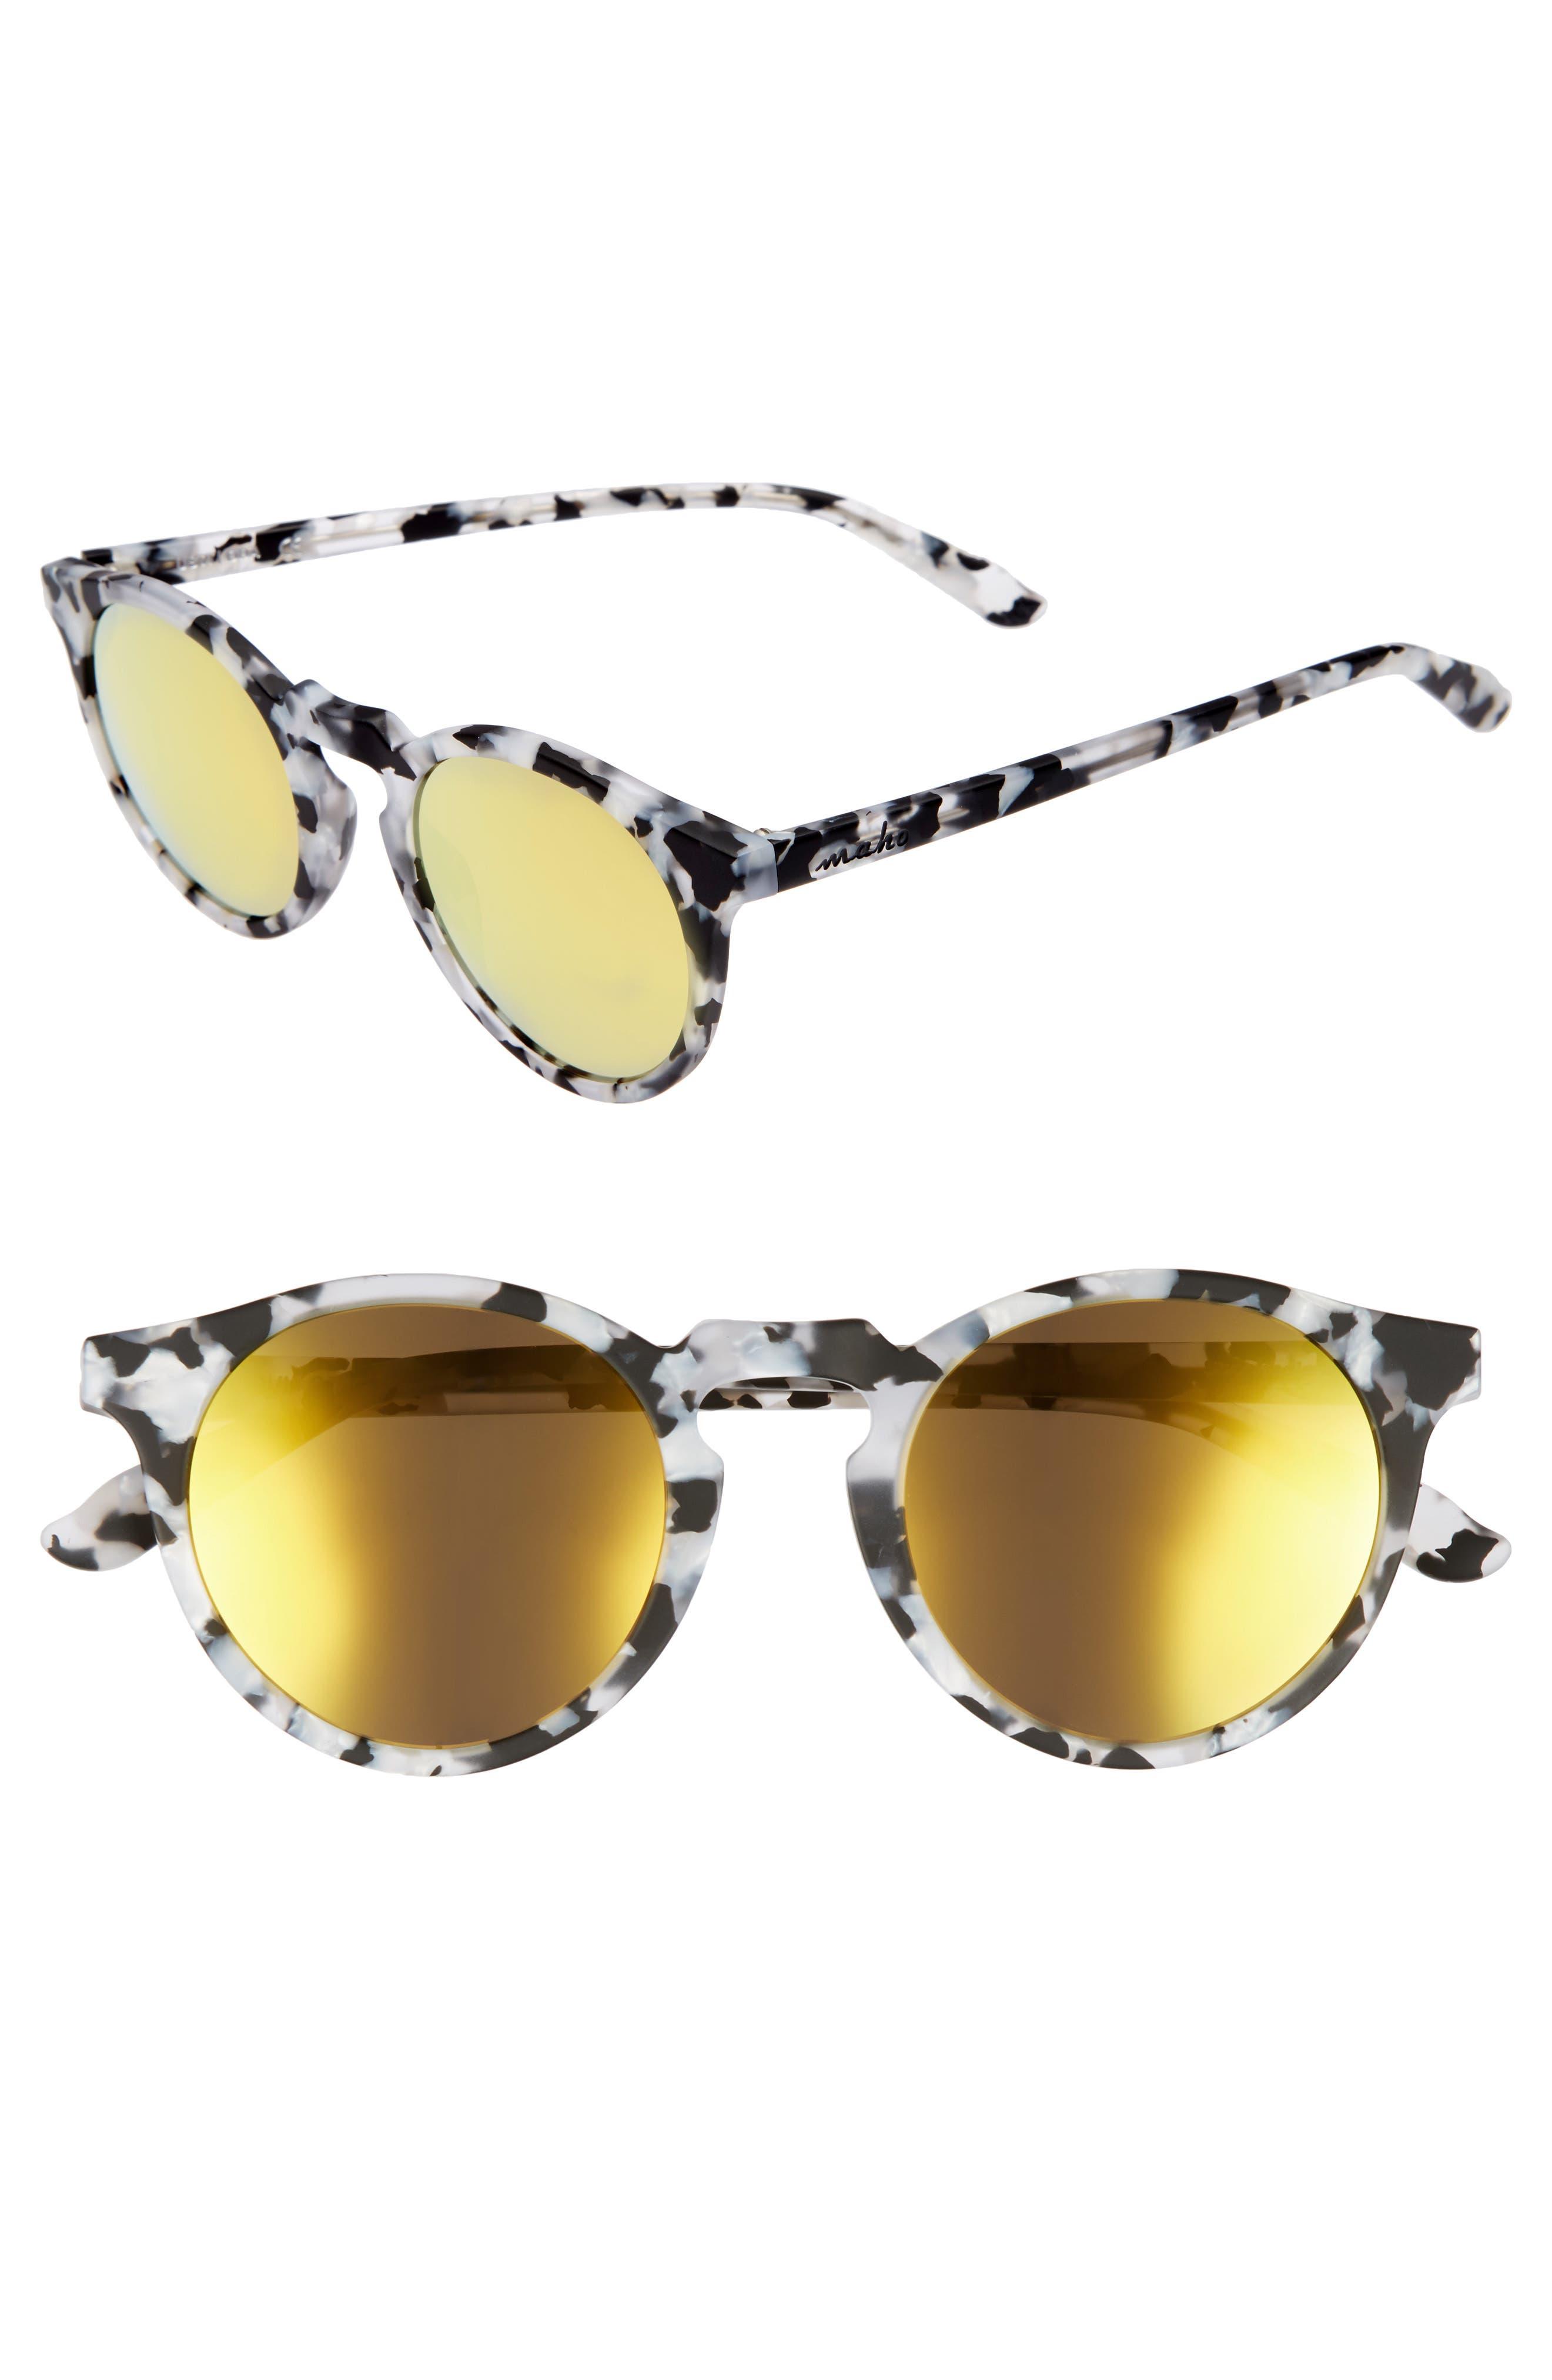 Stockholm 48mm Polarized Round Sunglasses,                         Main,                         color, 001